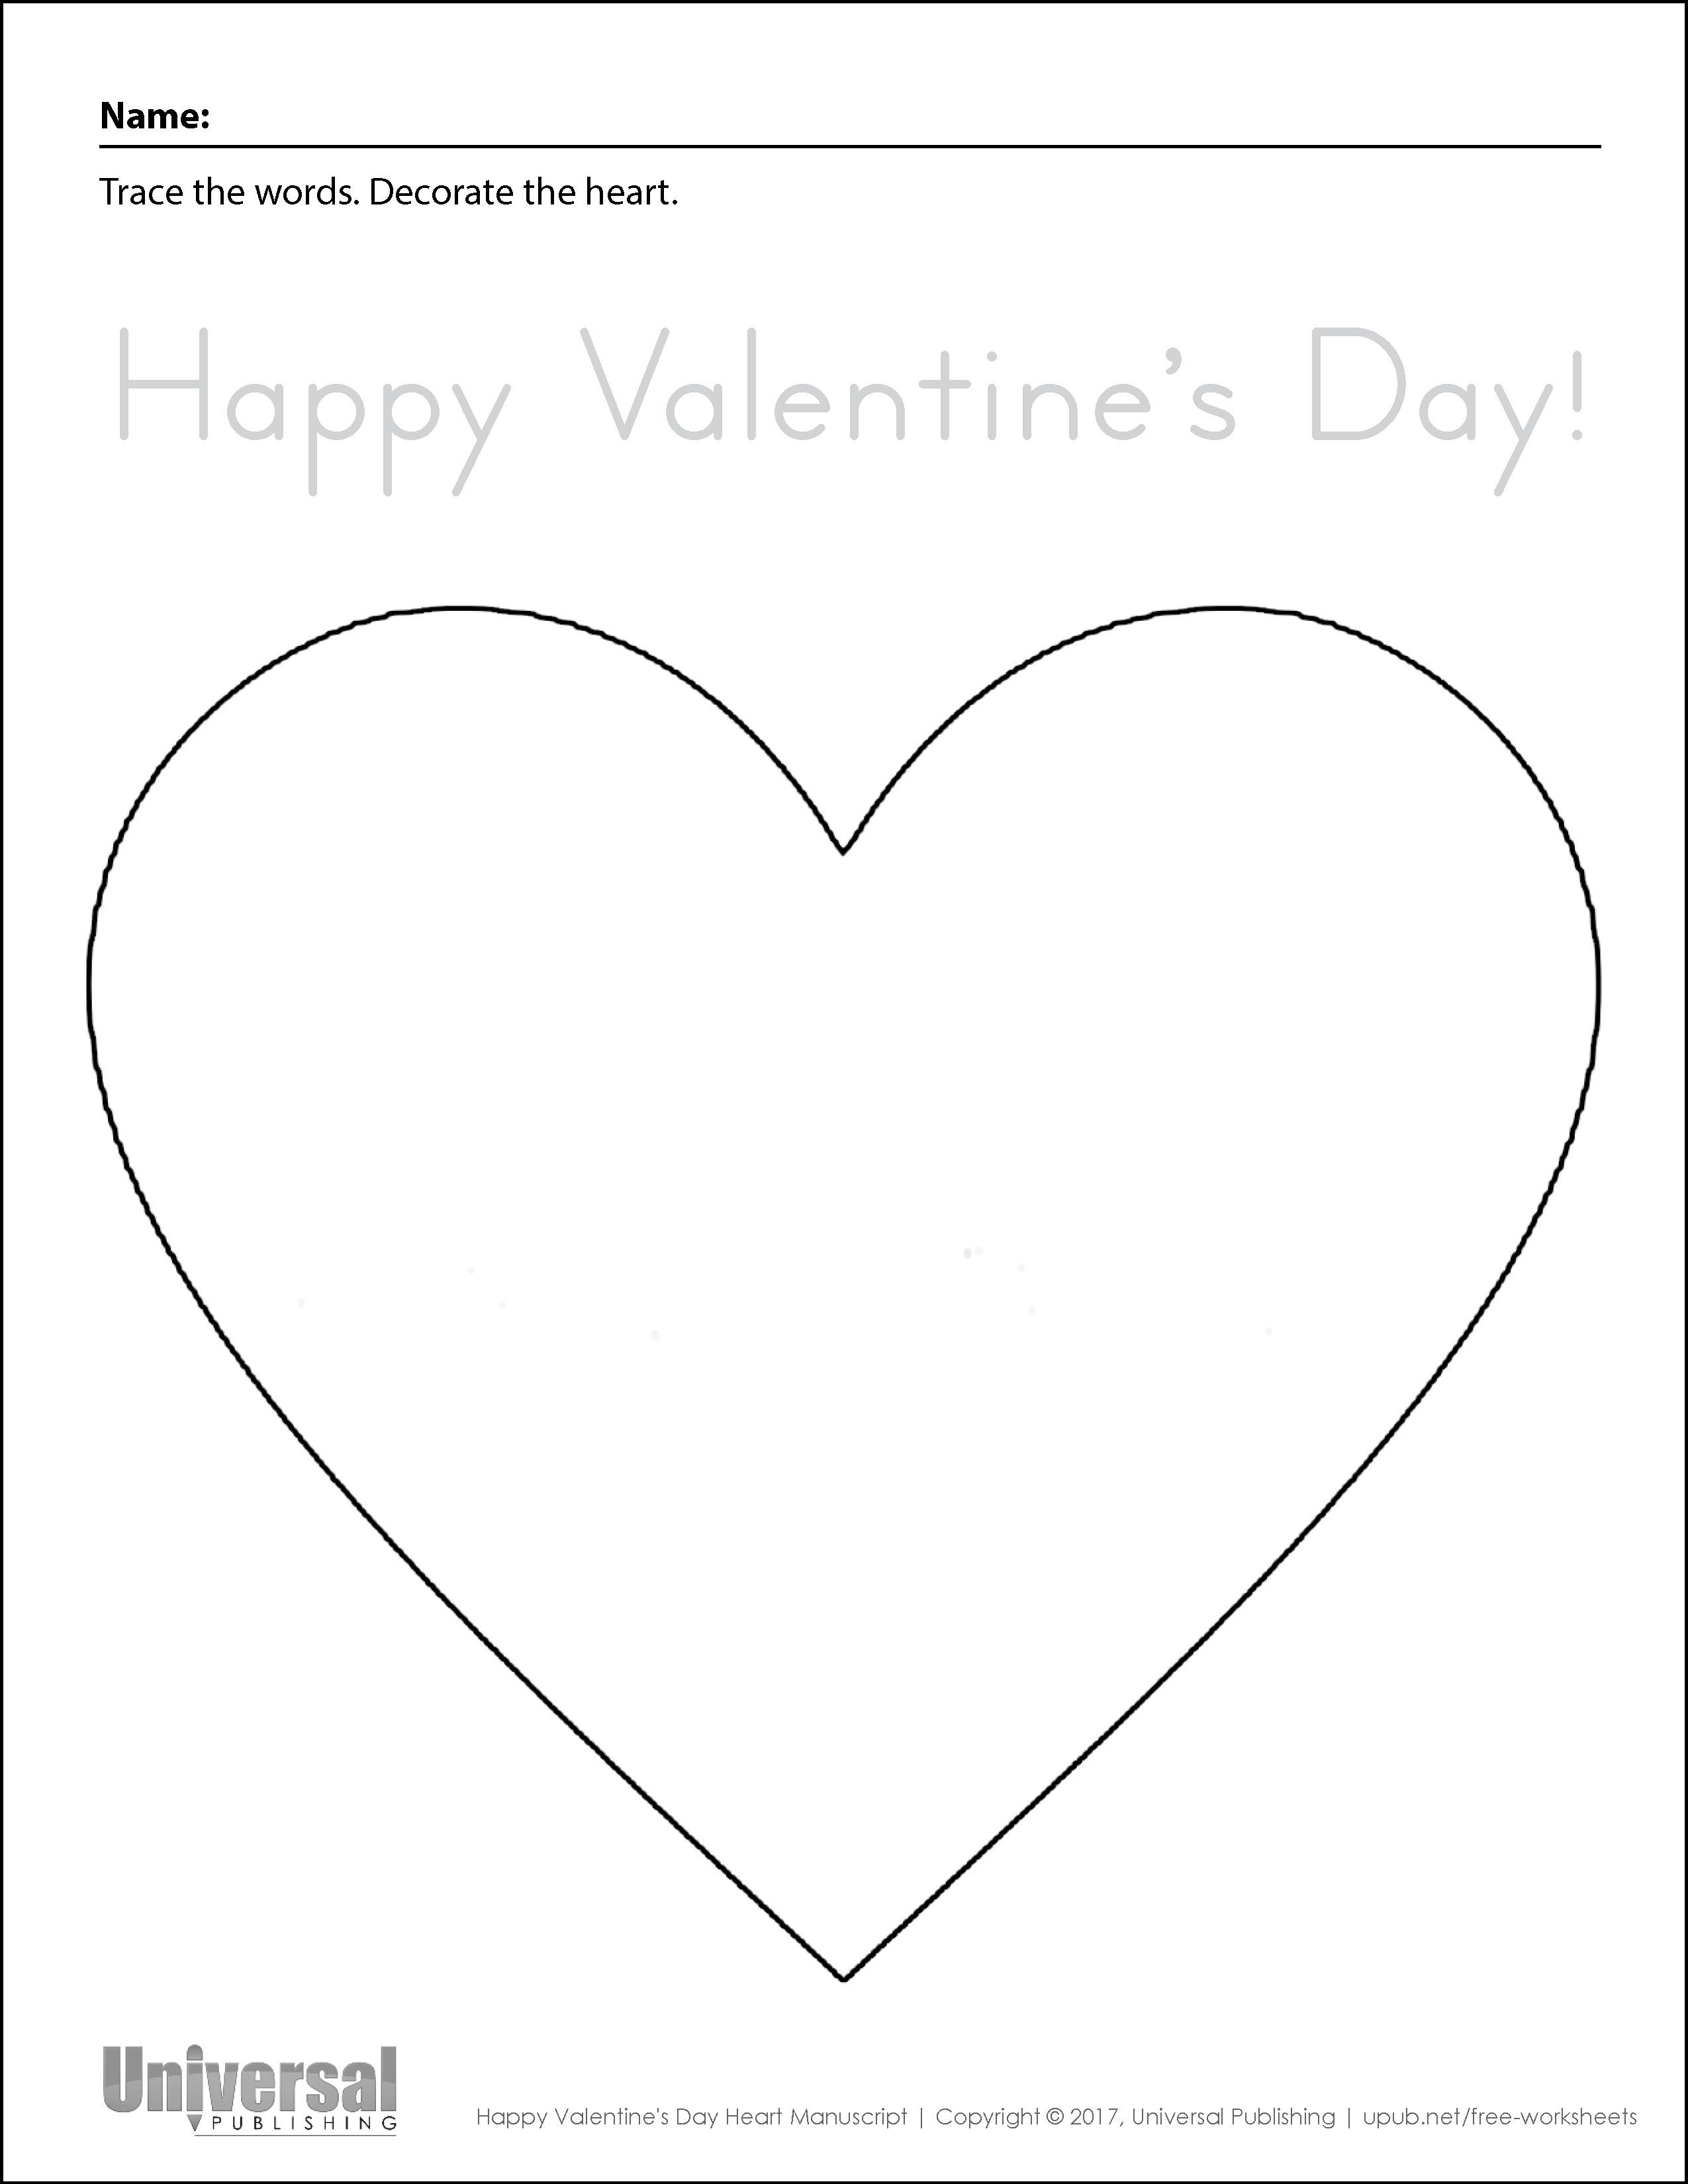 Happy Valentine's Day Heart Manuscript